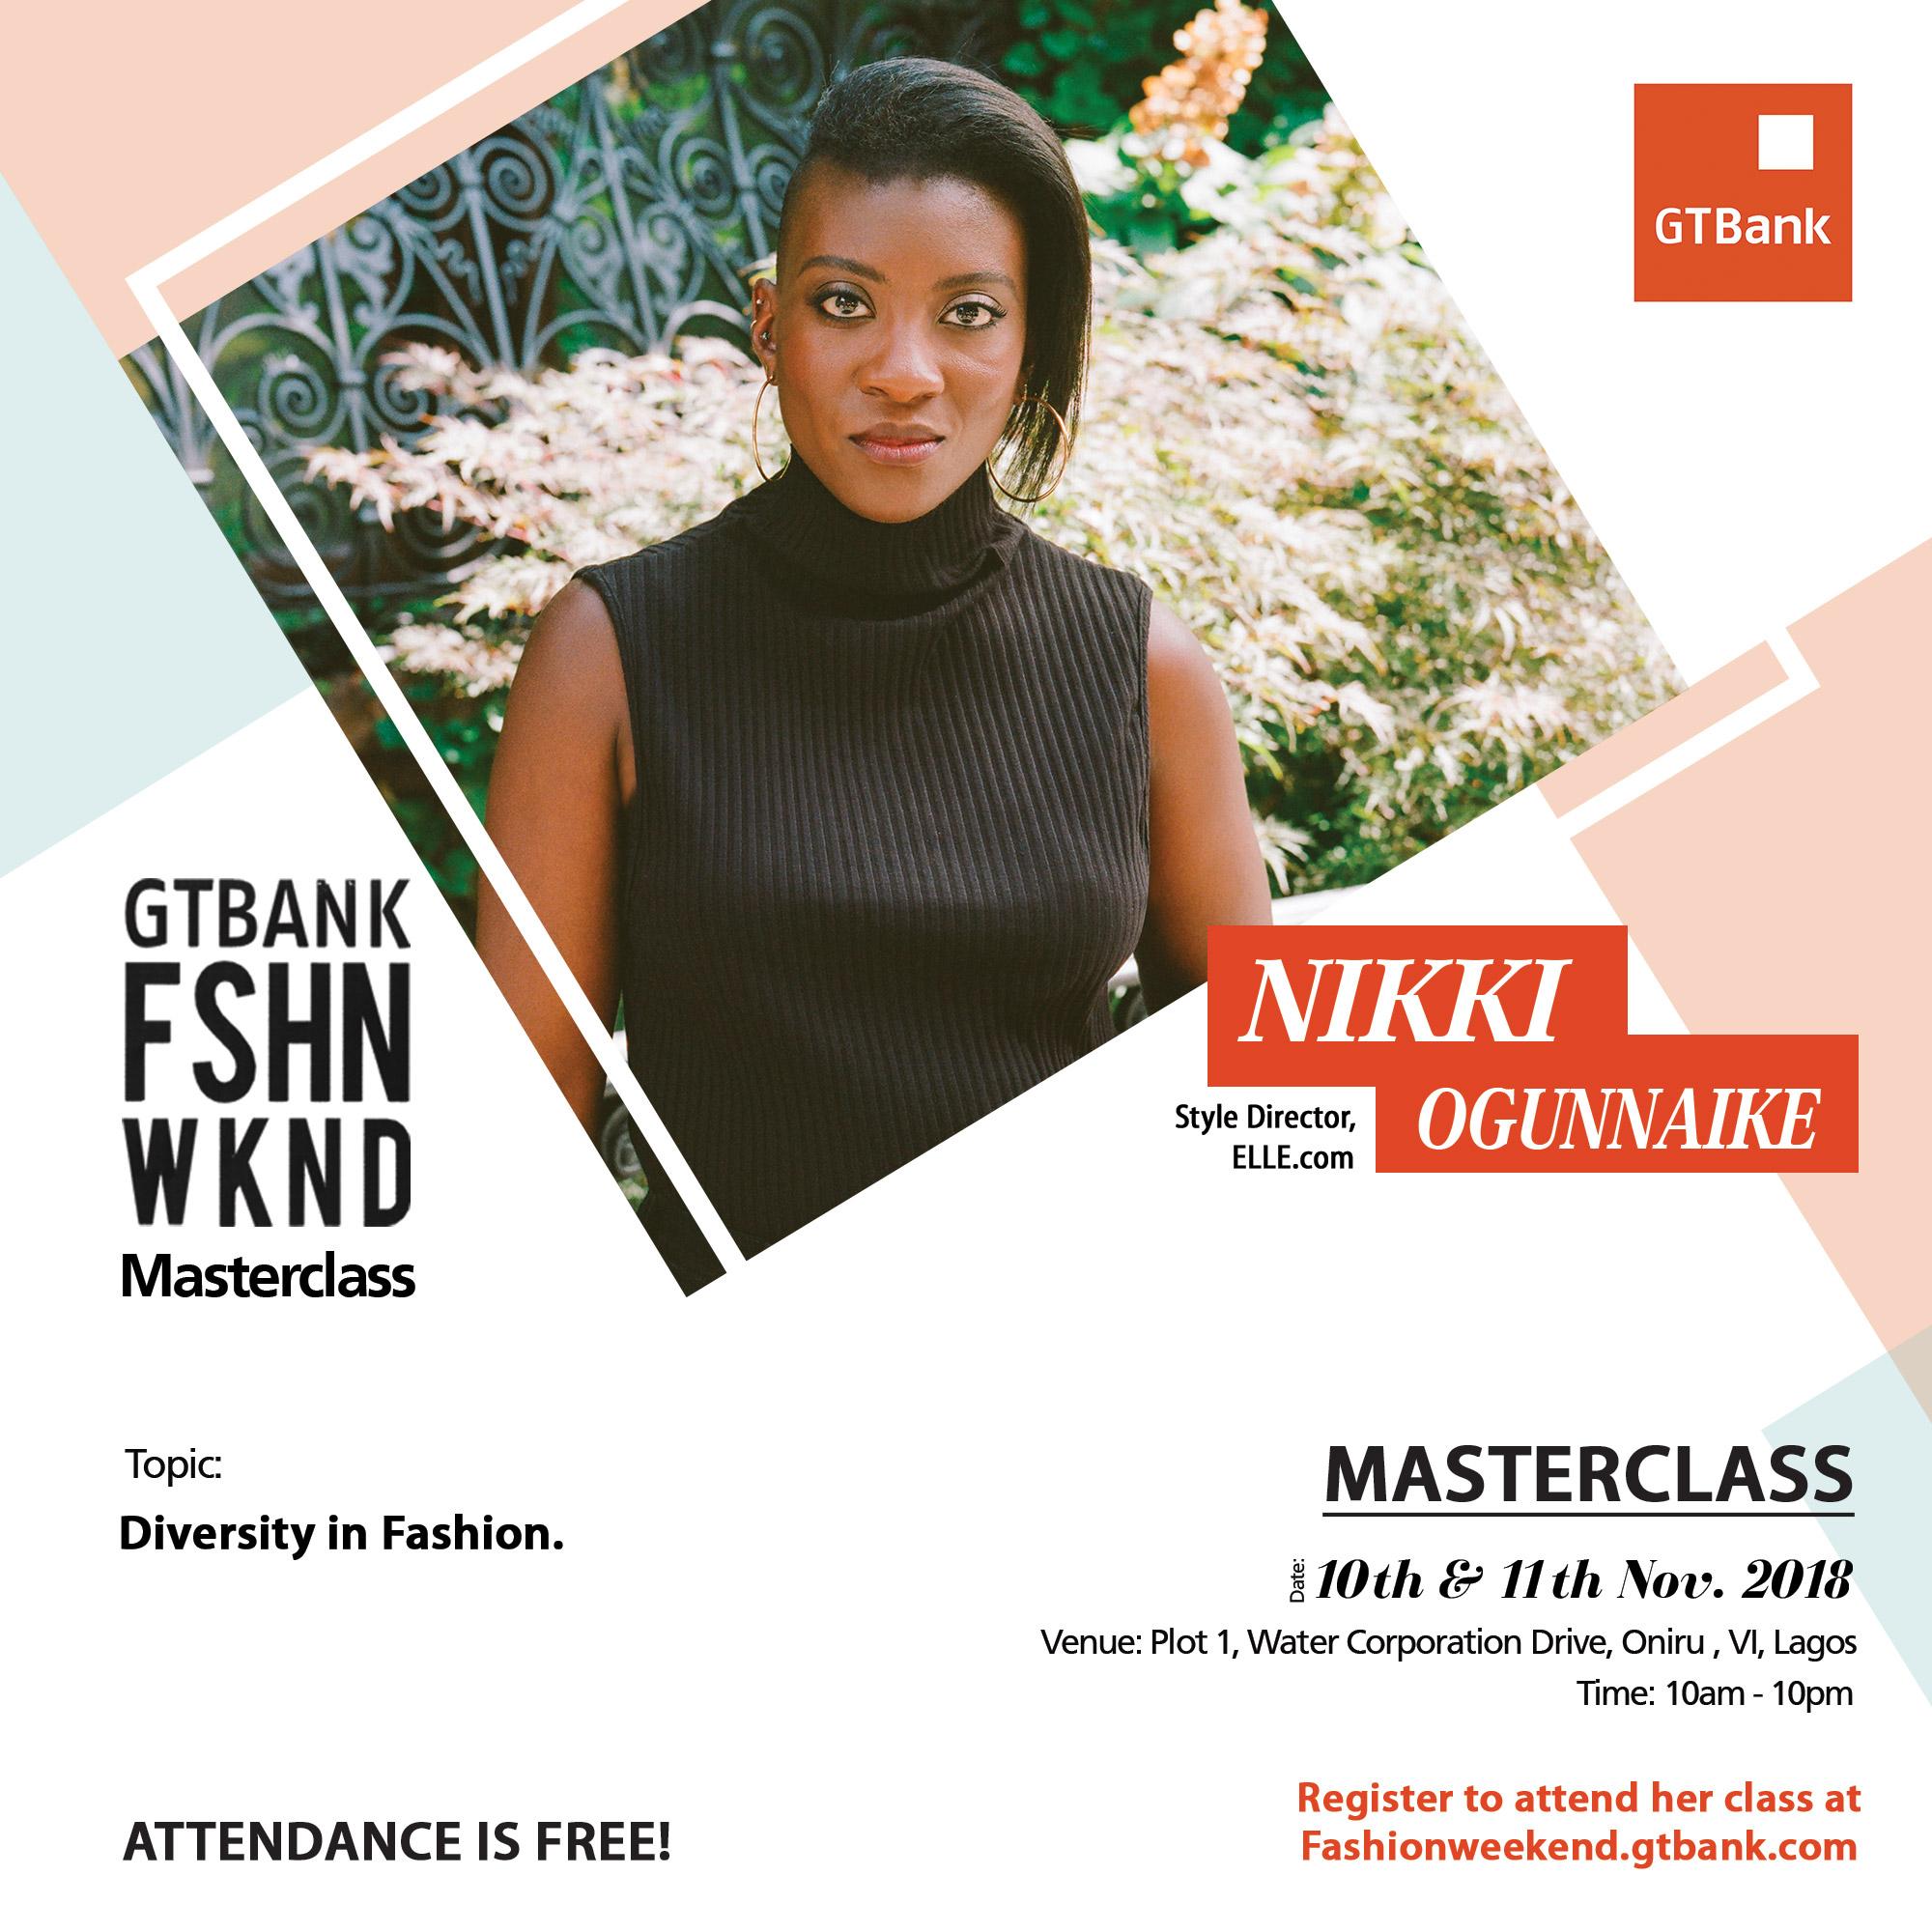 Join Julia Sarr-Jamoisin, BurakCakmak, Nike Ogunaike, Stavros Karelis & Anna Trevelyan for their master classes at the GTBank Fashion Weekend